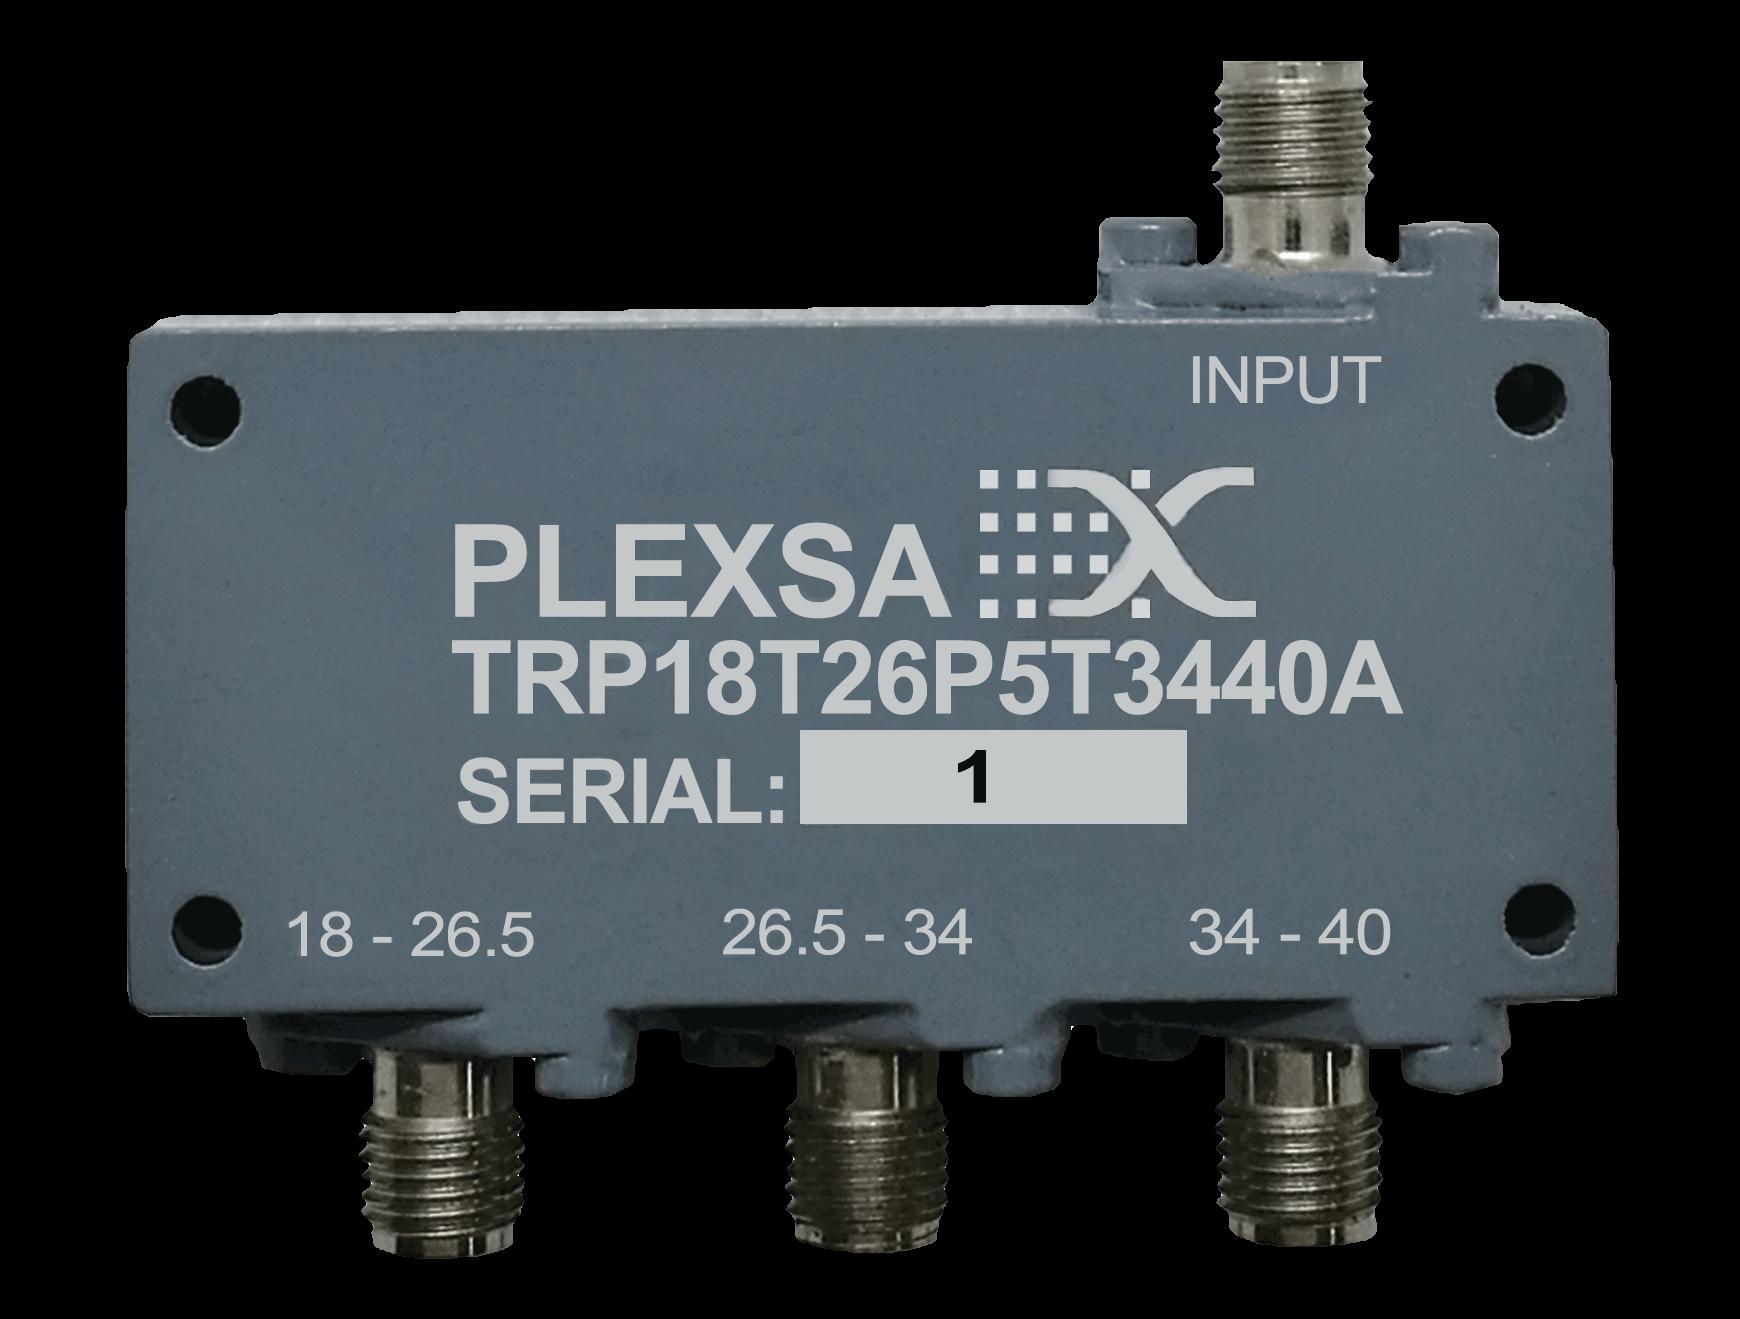 Triplexer 18 - 26.5 - 34 - 40 GHz